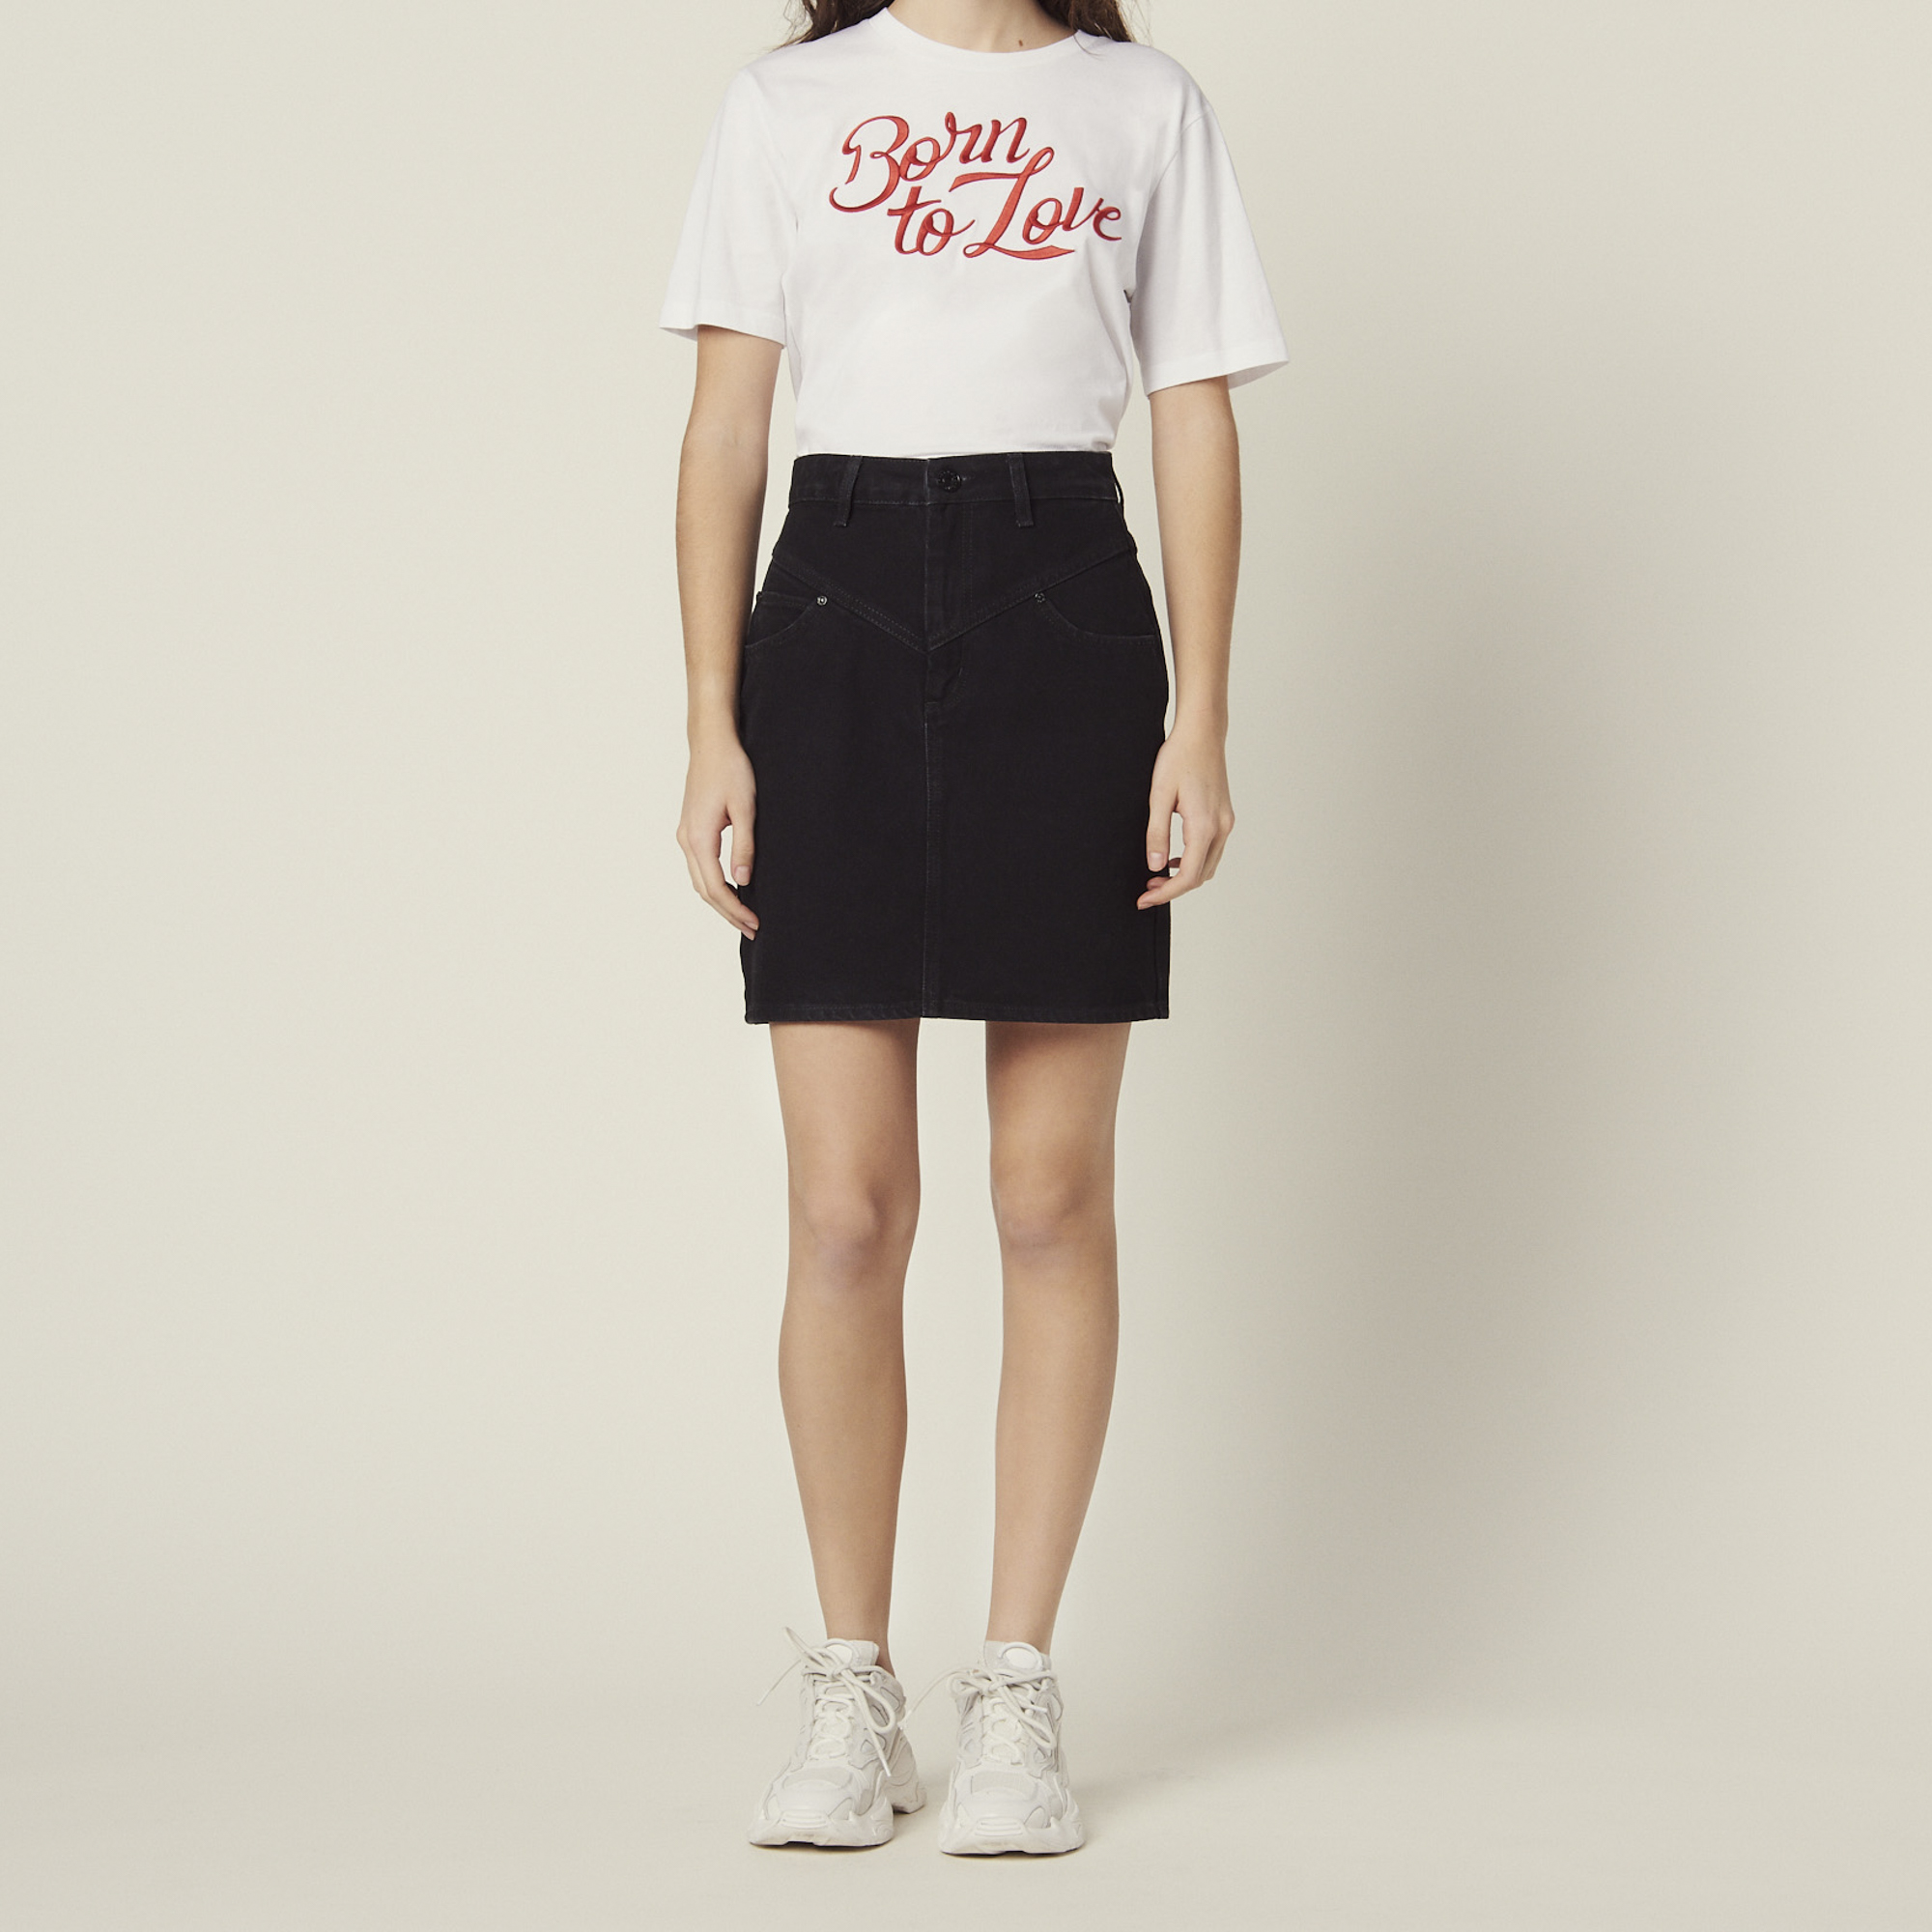 4247a0d303 Short denim skirt   Skirts   Shorts color Black ...